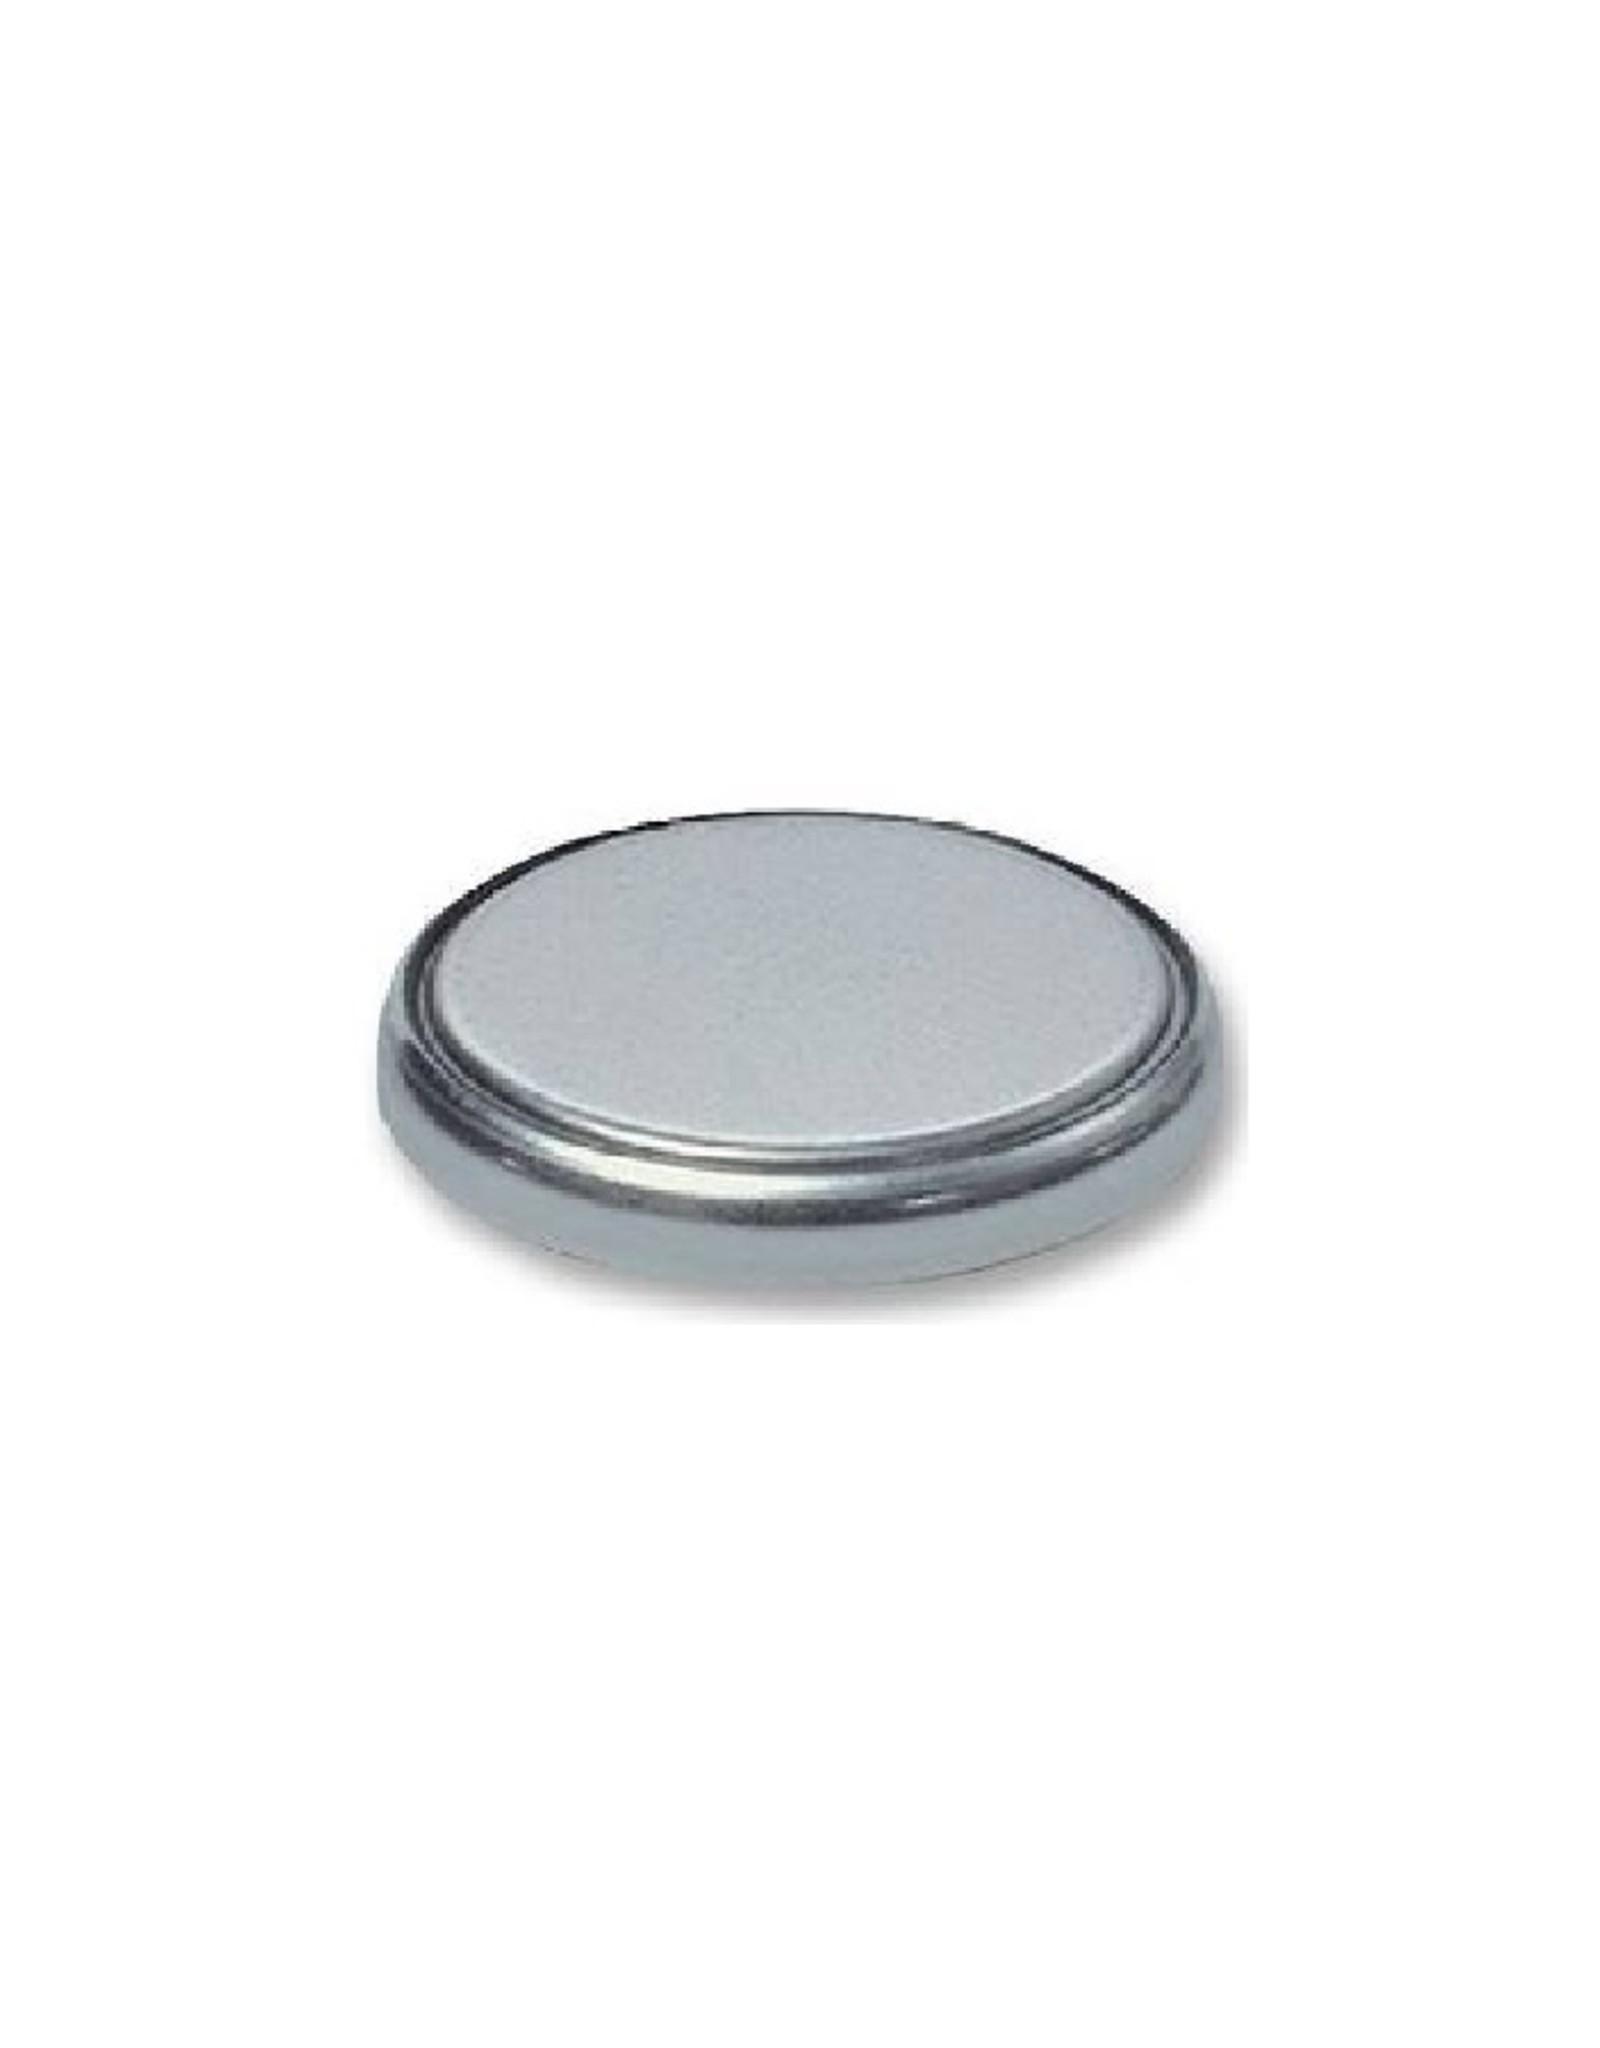 Duracell 3 Volt DR1616 knoopcel reserve batterij